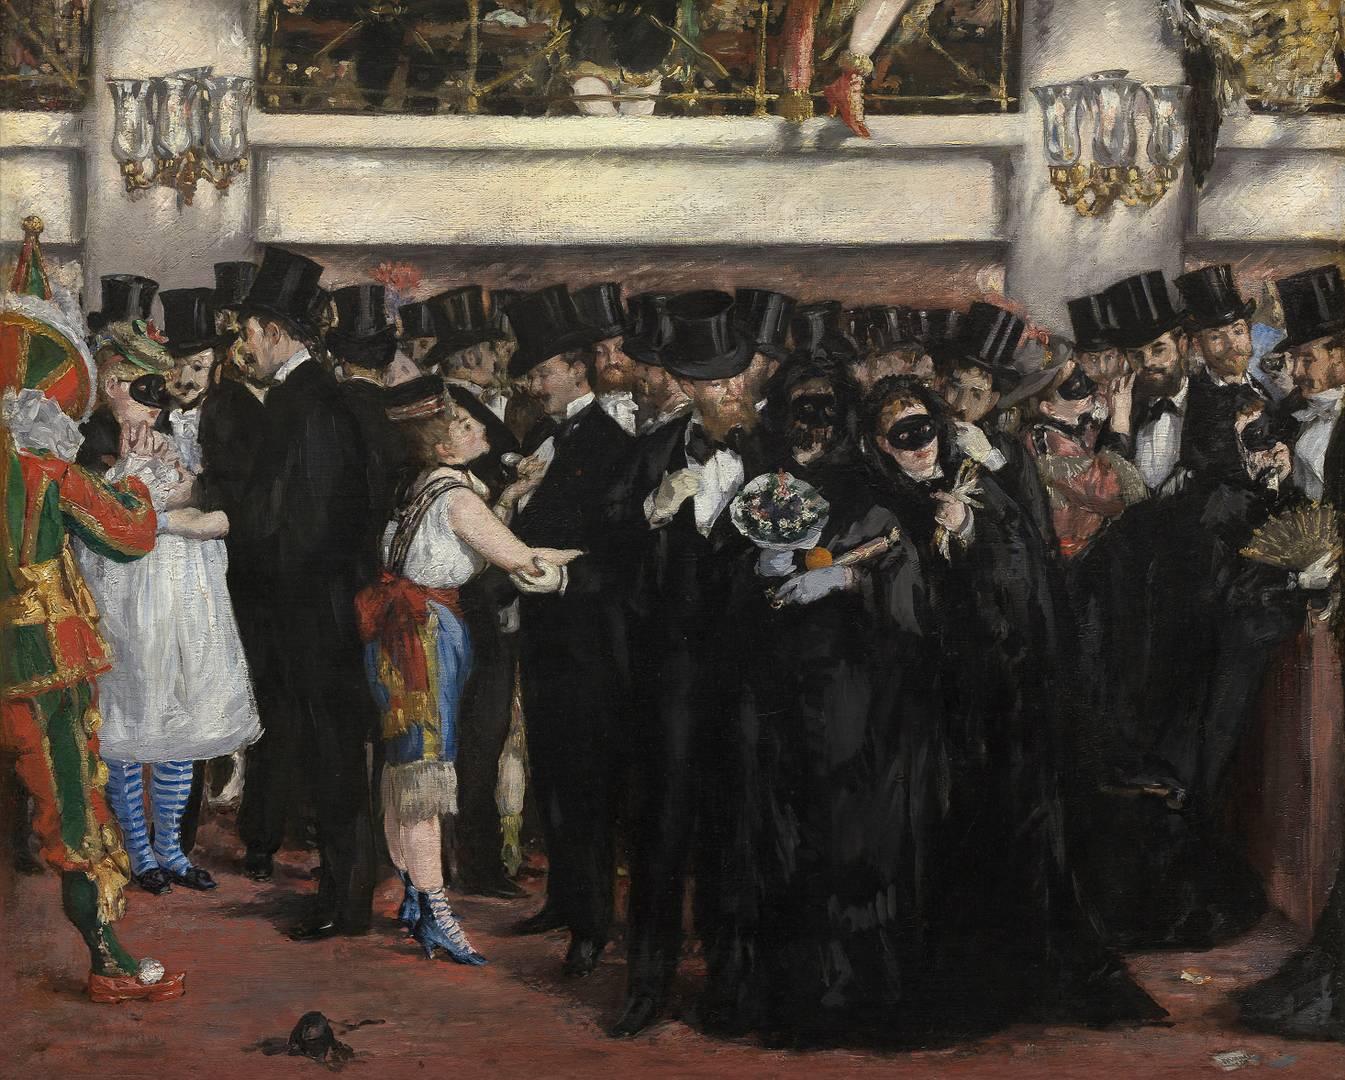 Эдуар Мане. Бал-маскарад в опере. 1873